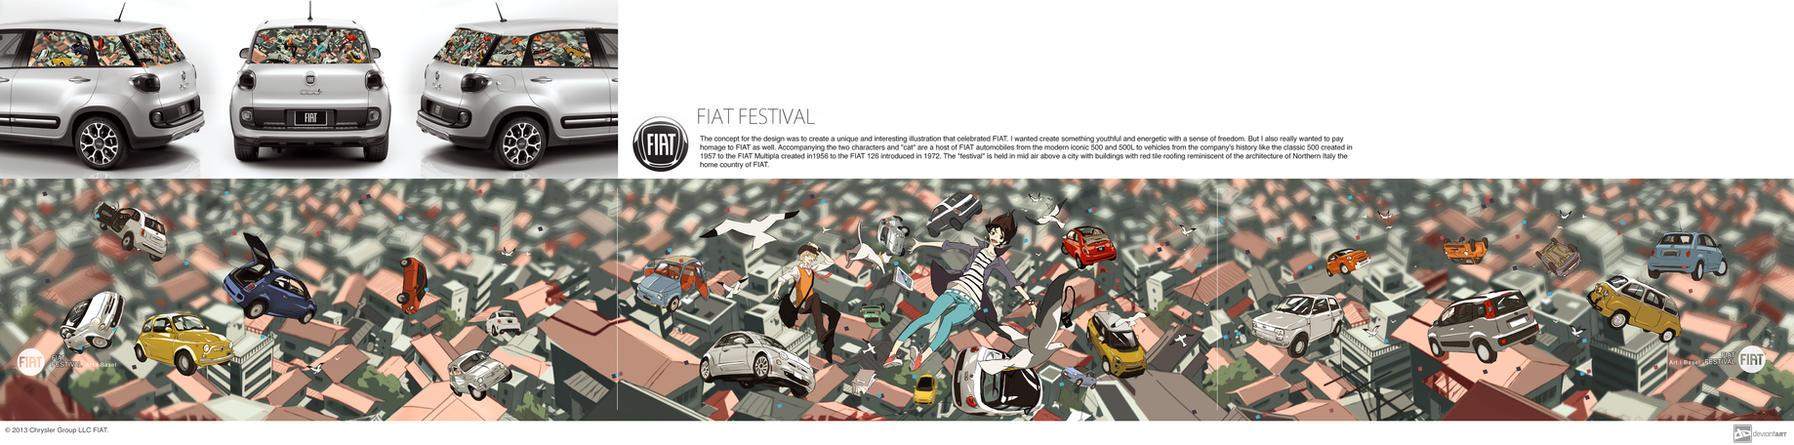 Fiat Festival concept by P-Shinobi